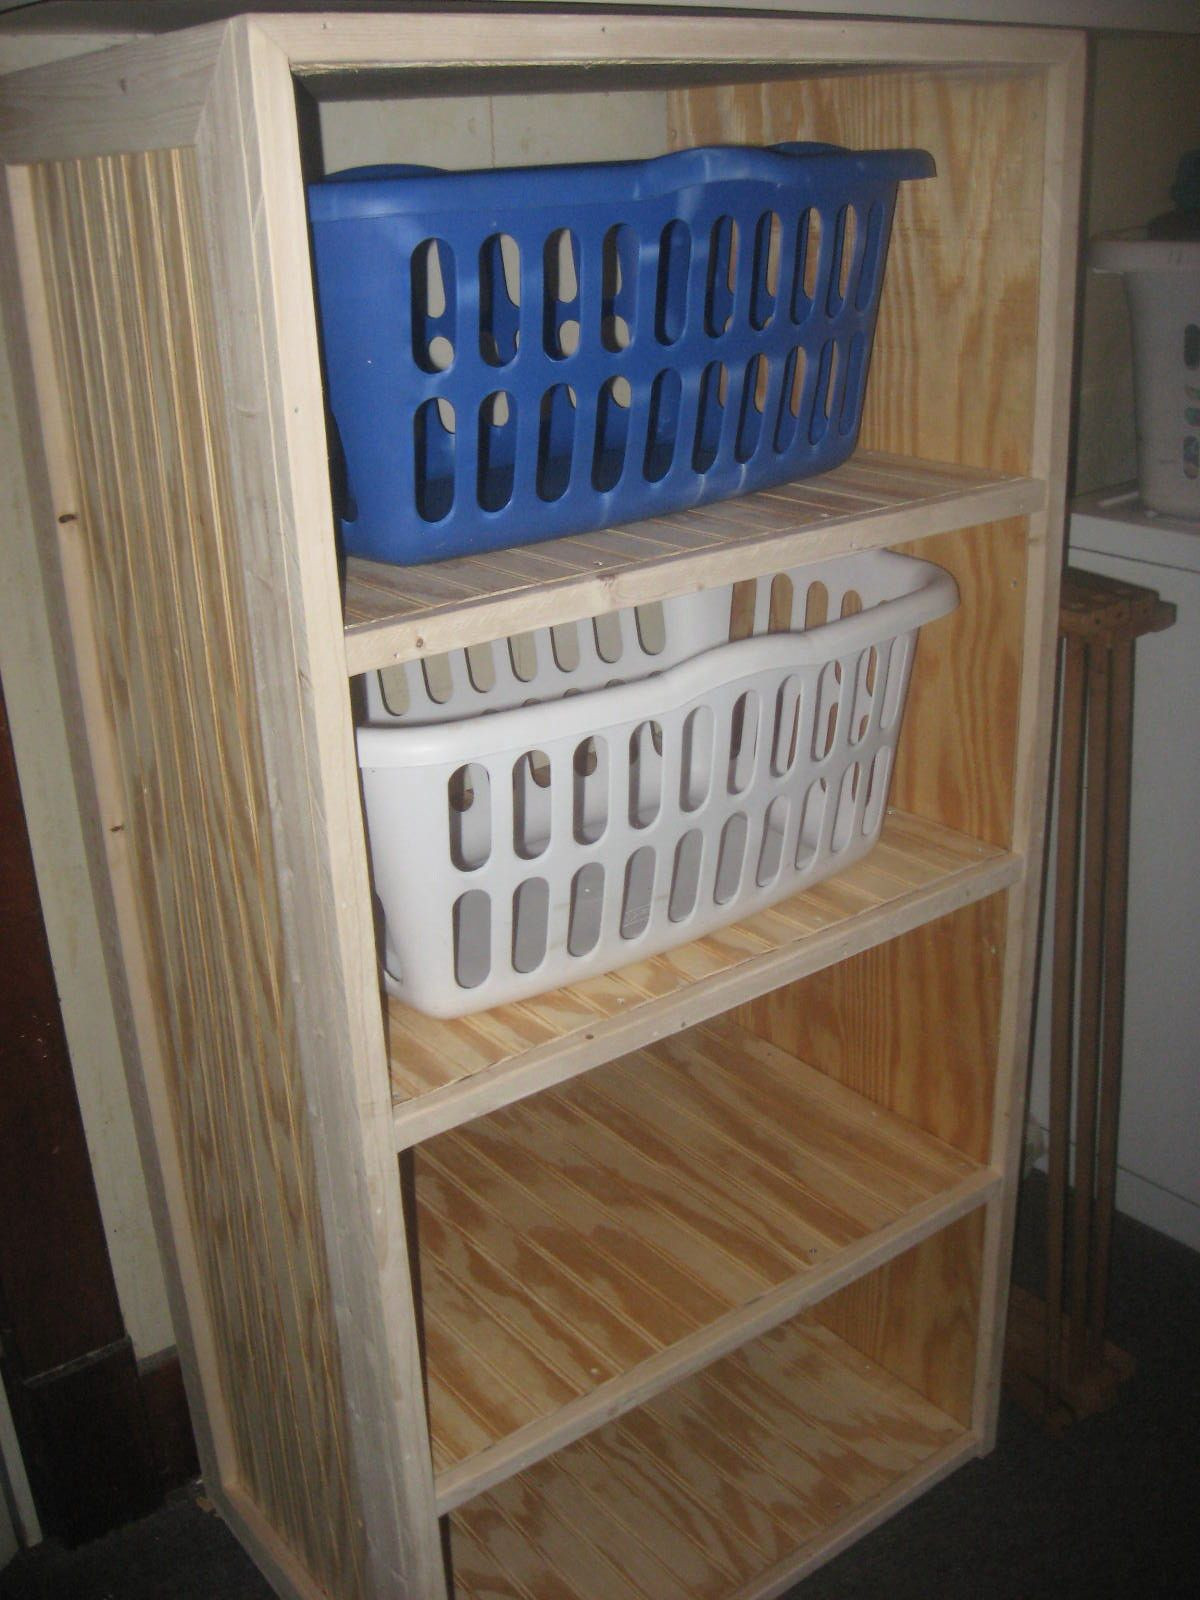 Best ideas about DIY Shelf Organizer . Save or Pin DIY Laundry Basket Shelves Now.